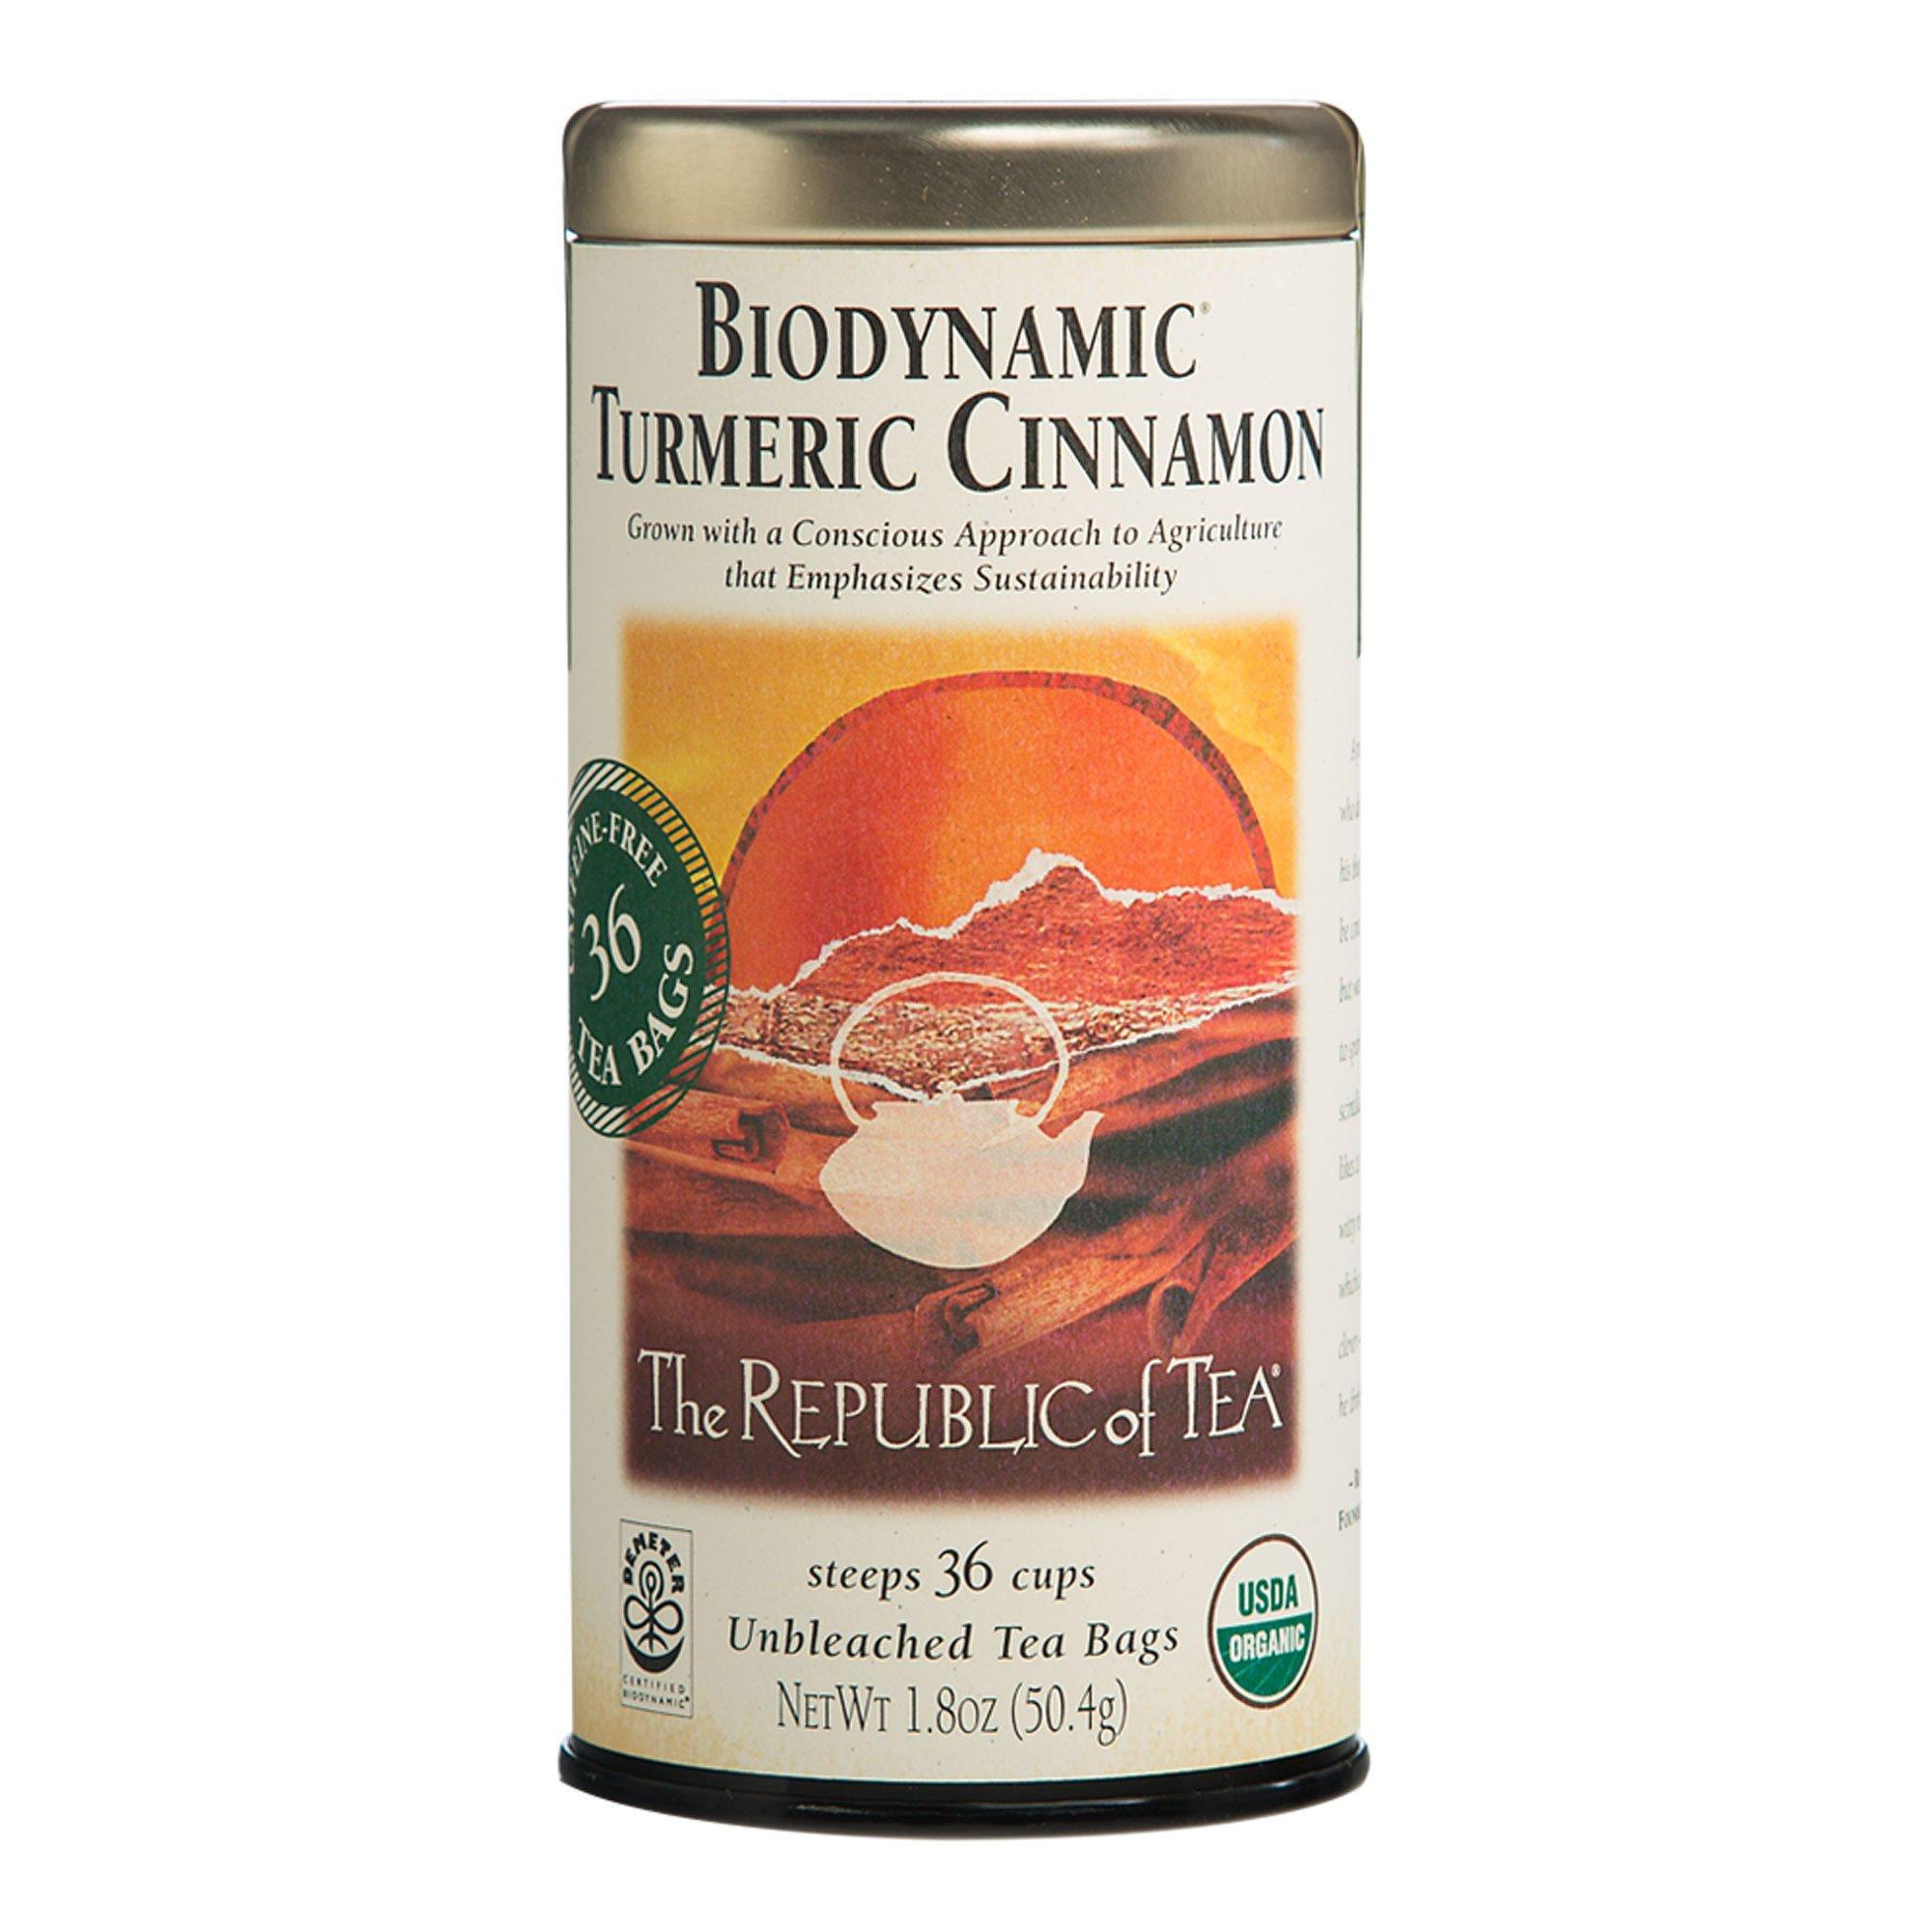 The Republic Of Tea Biodynamic Turmeric Cinnamon Herbal Tea, 36 Tea Bags, Premium 100% Biodynamic Blend